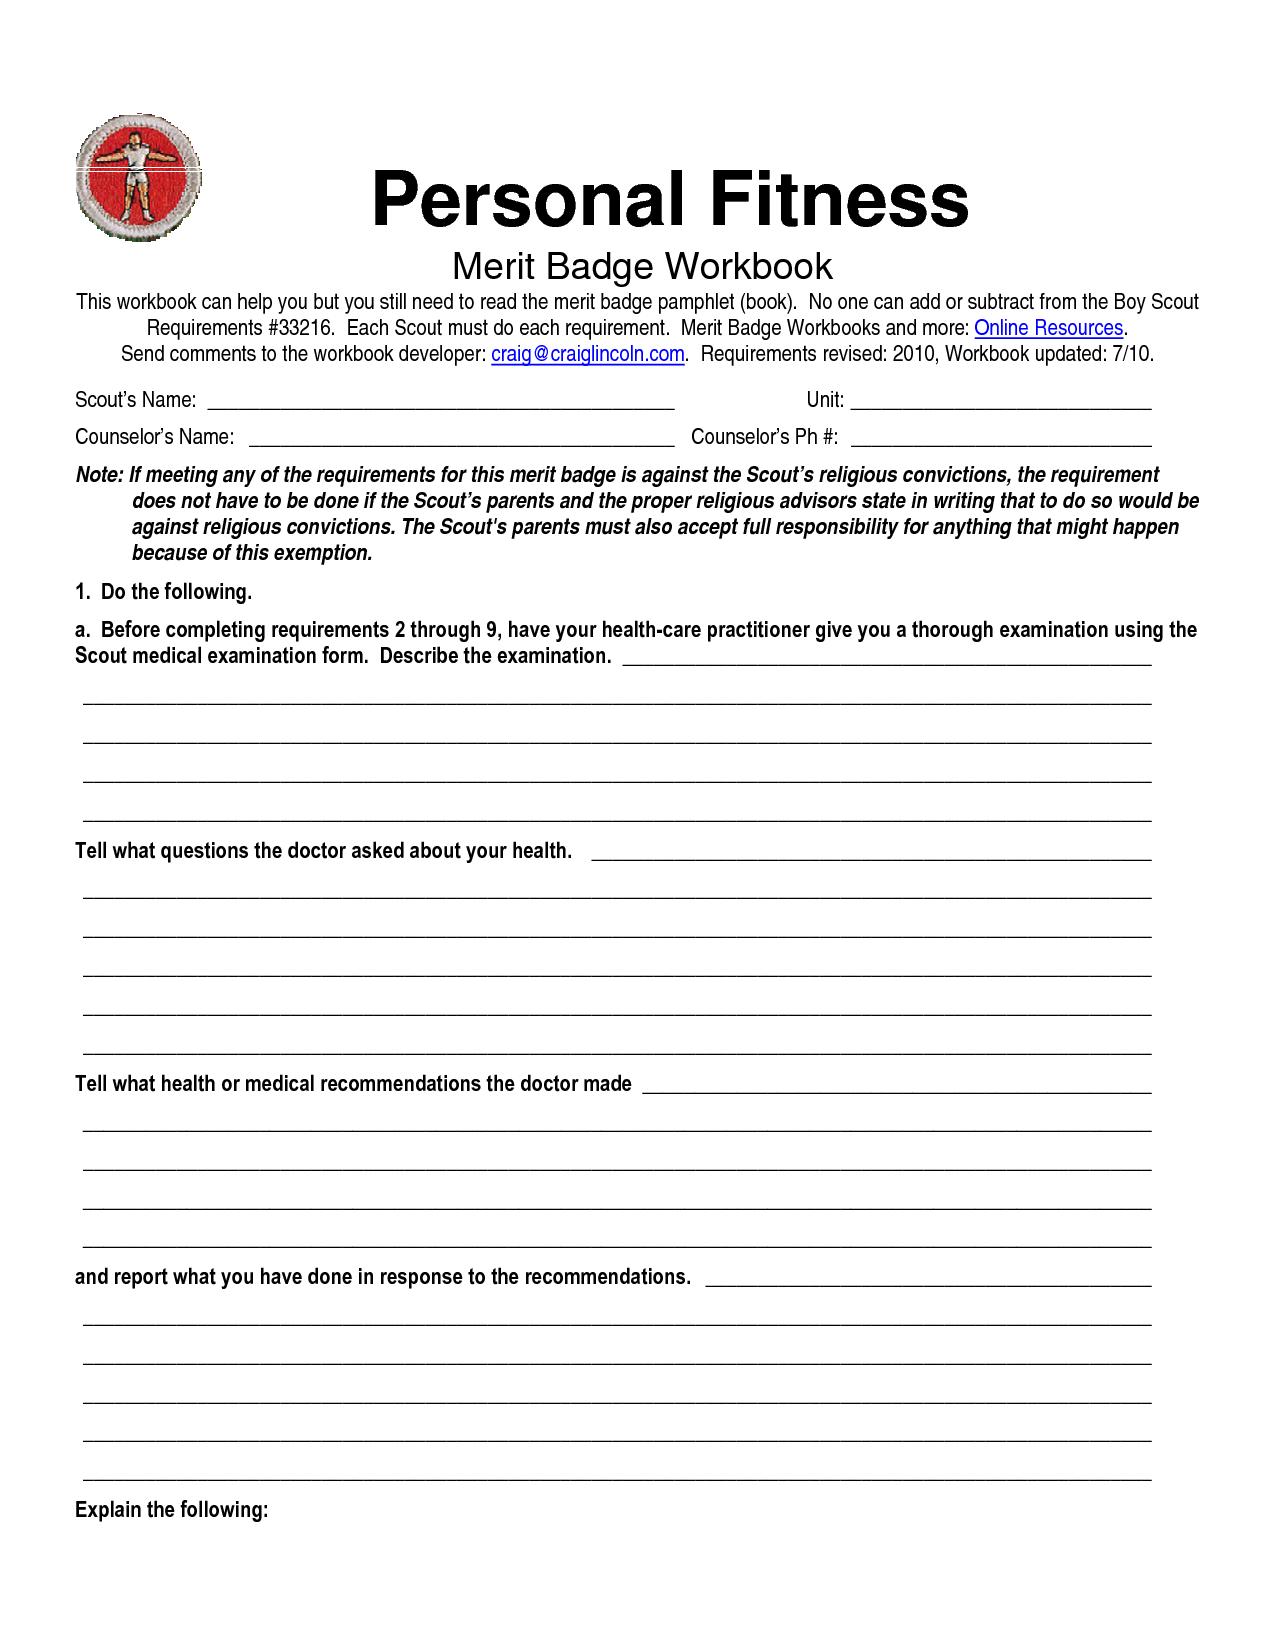 Family Life Merit Badge Worksheet Answers